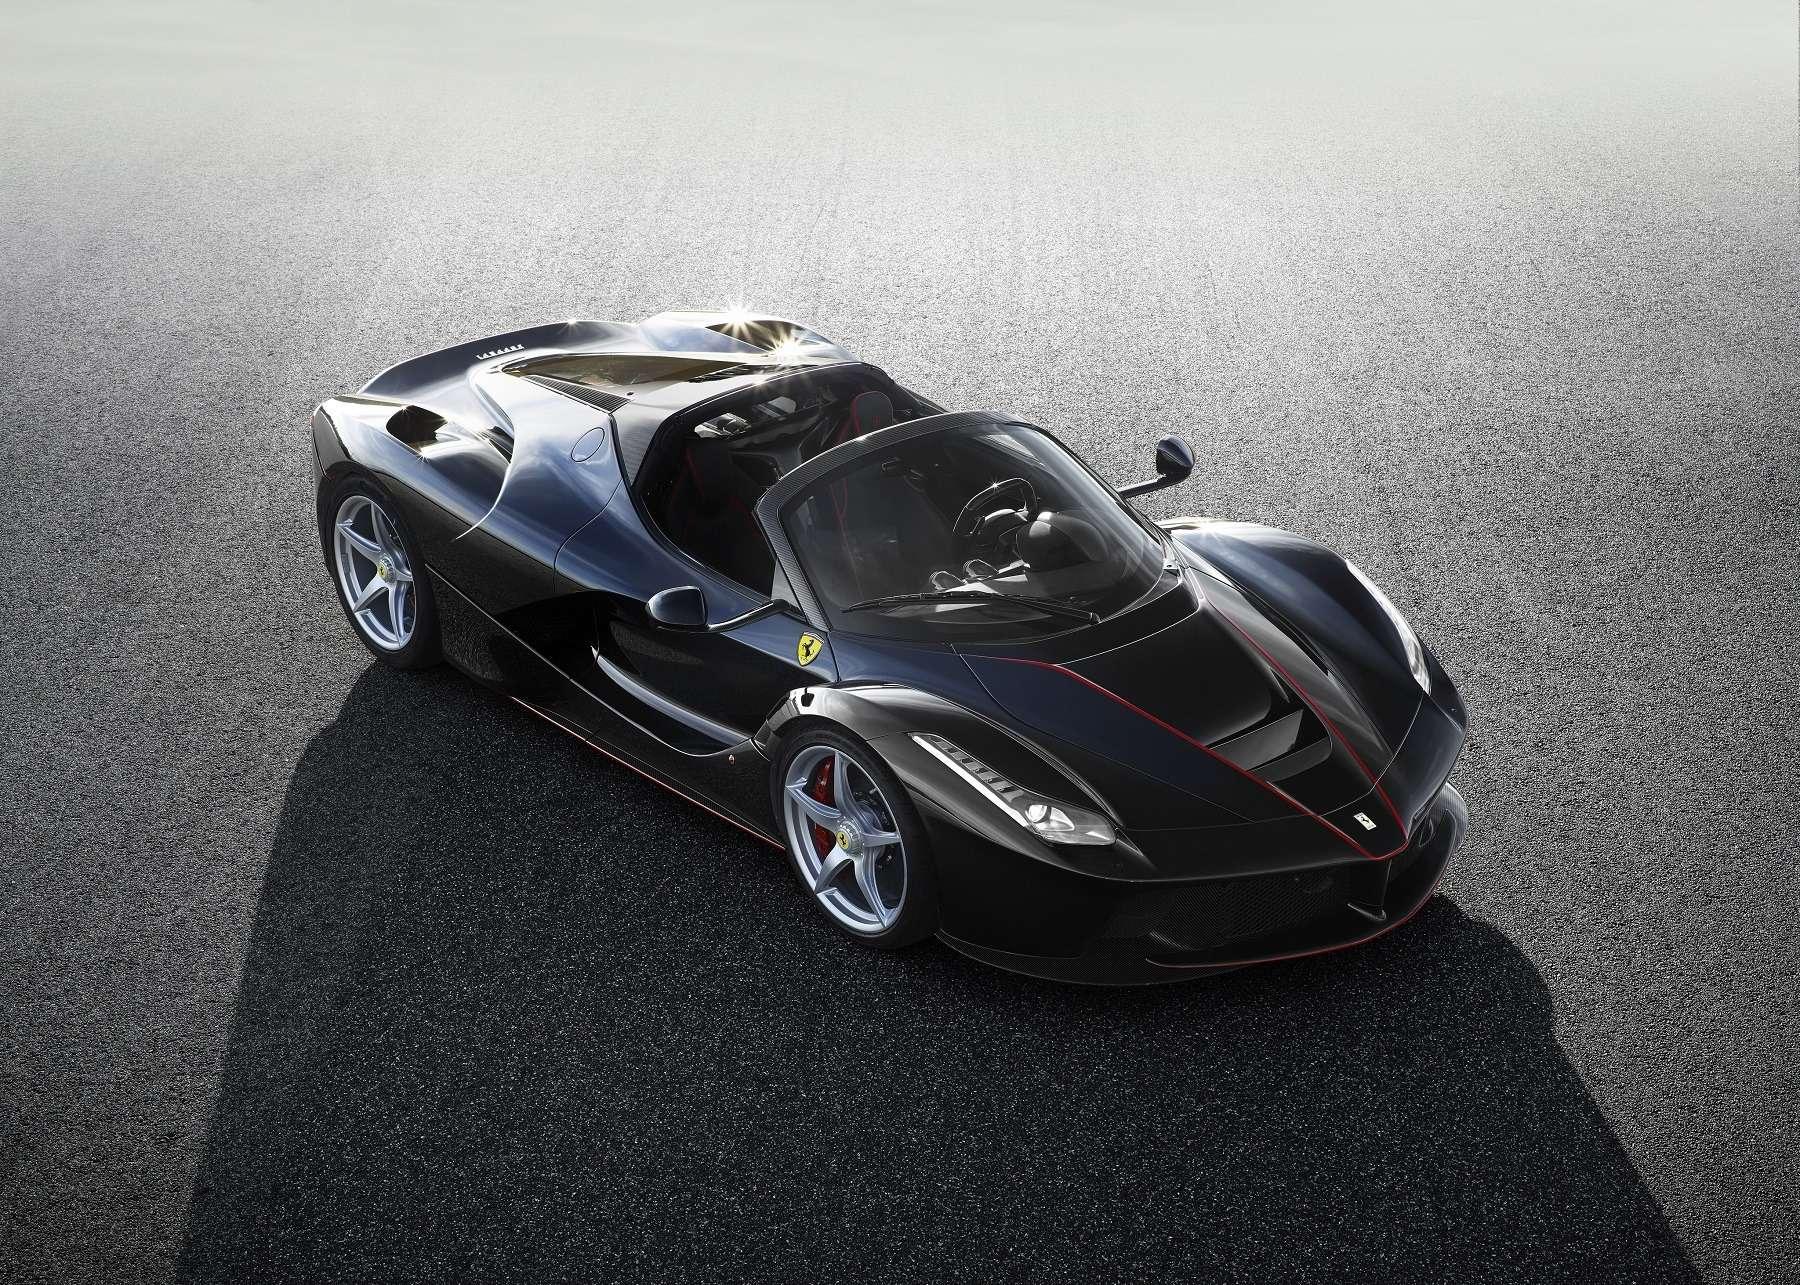 В двух словах овеликом: Ferrari представила гиперкар LaFerrari Aperta— фото 605420